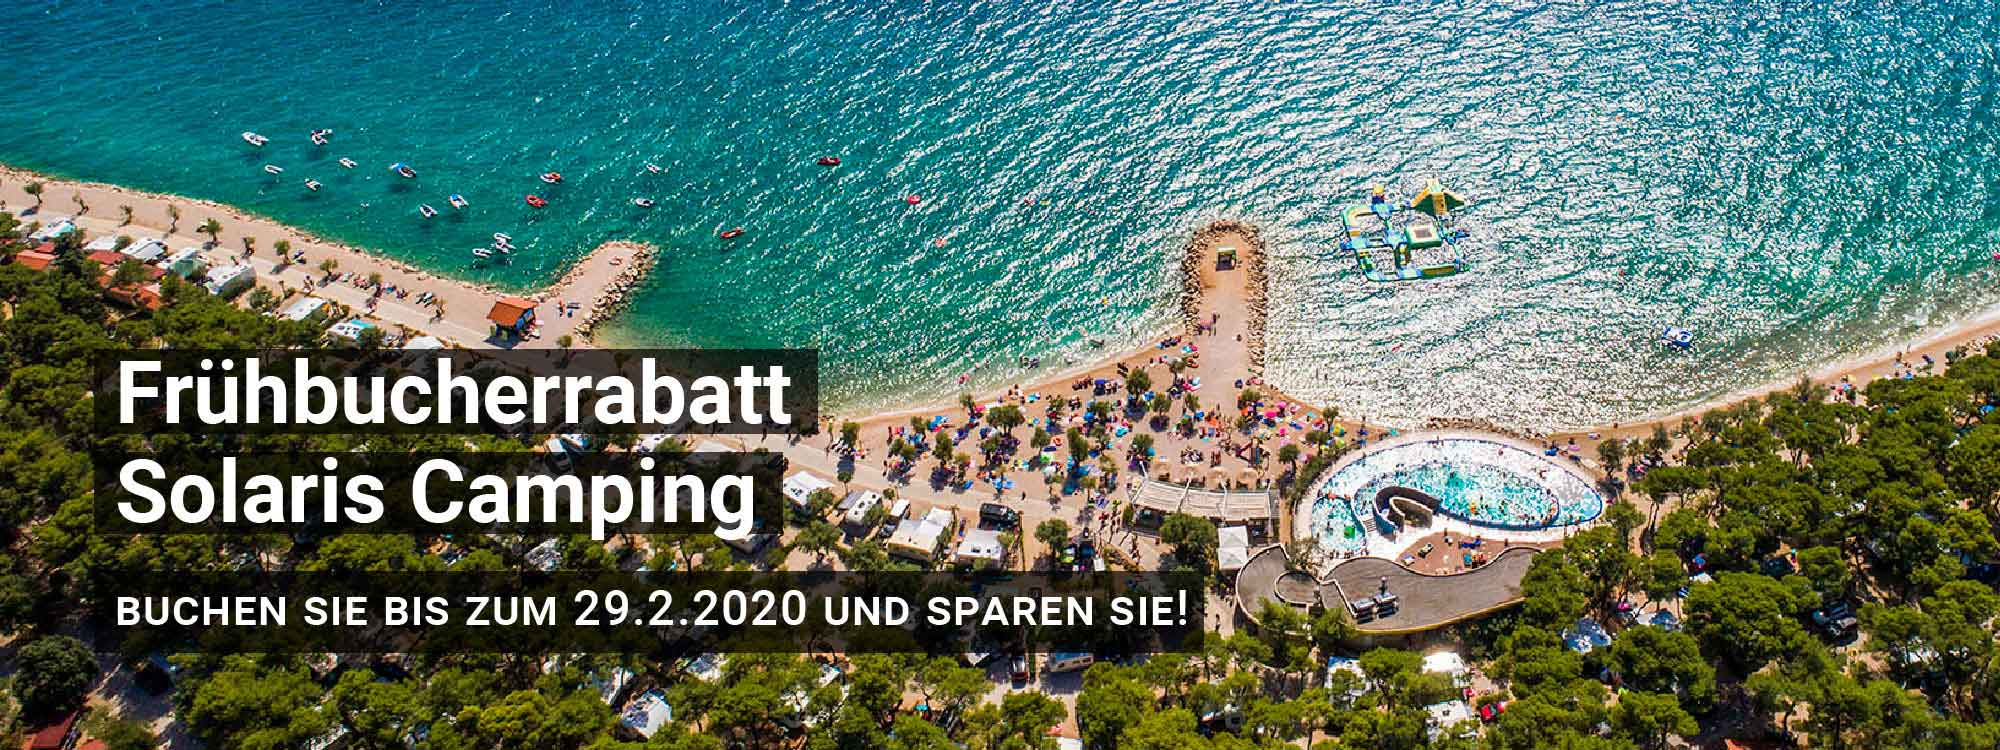 Web-slider-Rani-booking-kamp-2020-03-DE